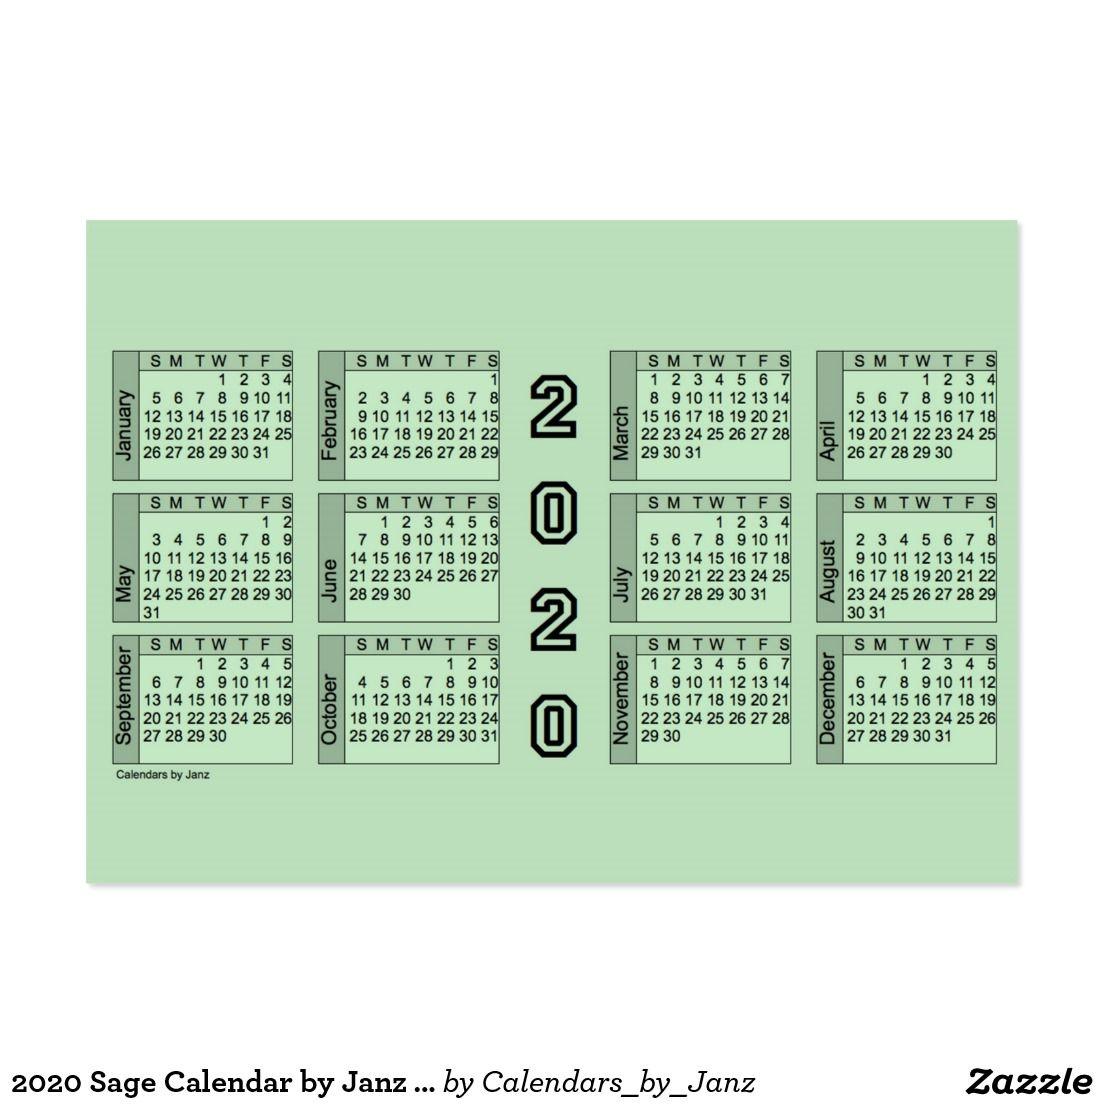 Calendar 2020 Business Card July December Create your own Profile Card | Zazzle.| Calendars by Janz